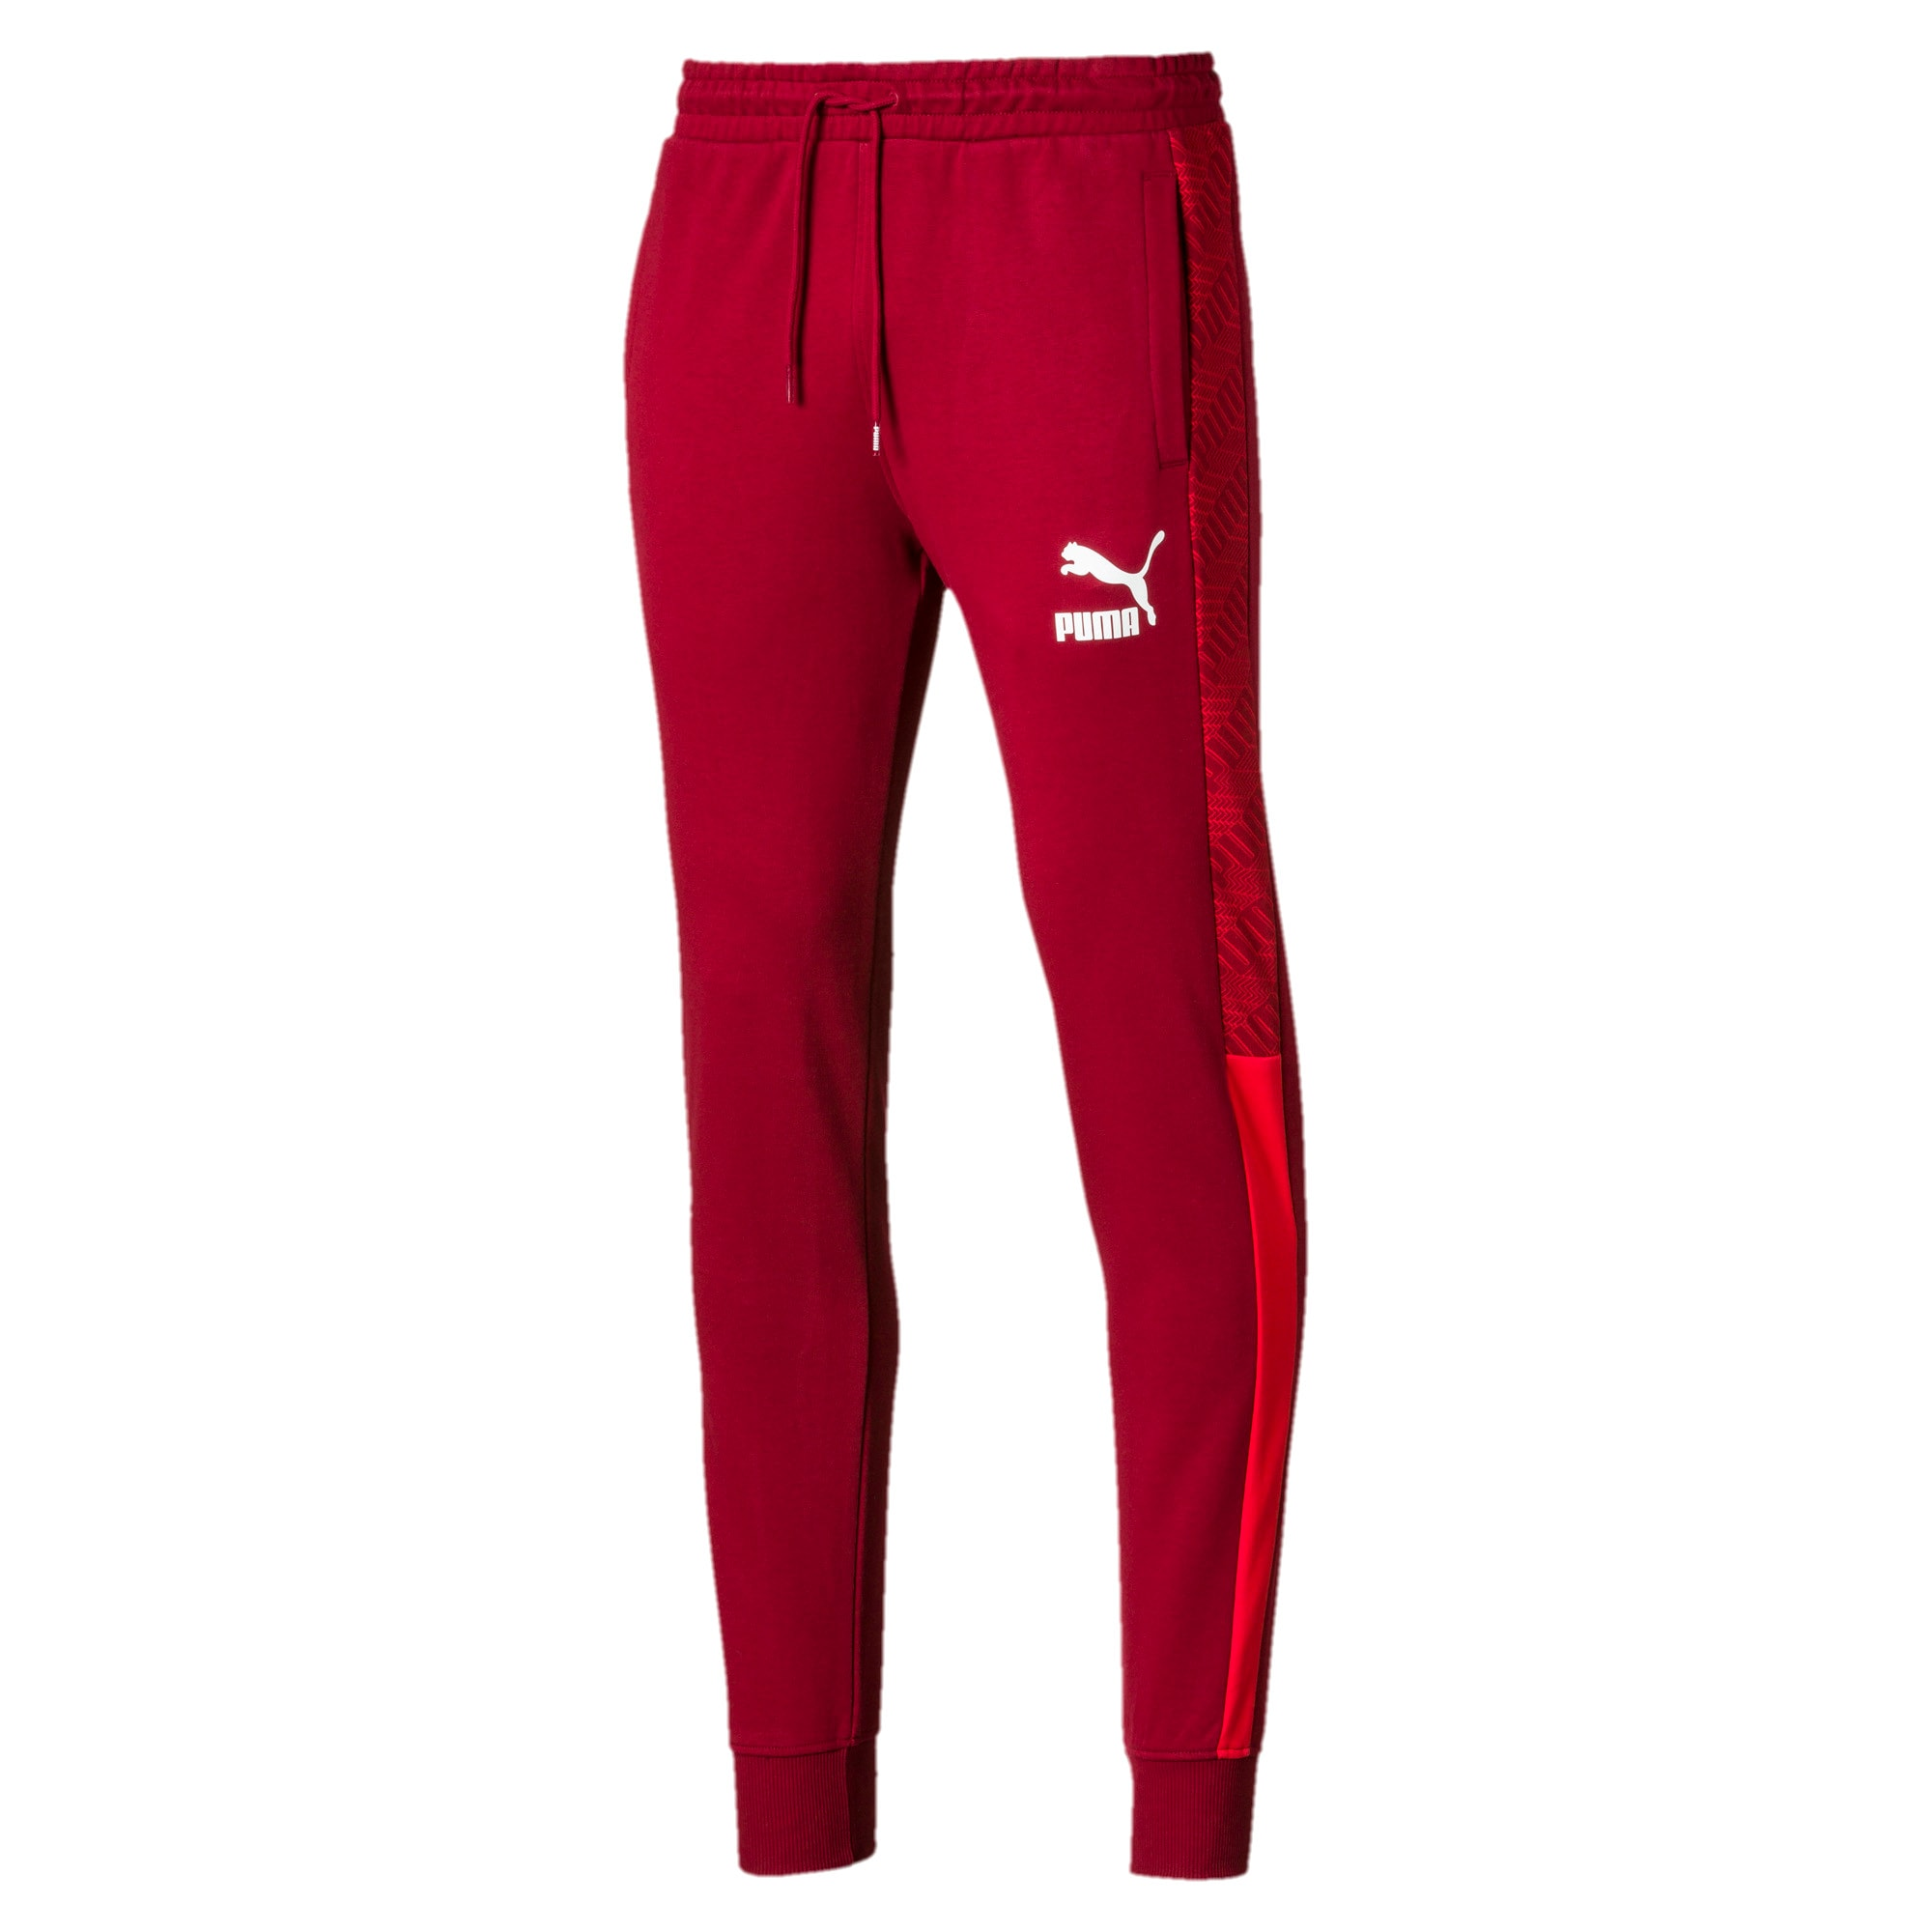 Thumbnail 1 of T7 Men's AOP Track Pants, Rhubarb-Repeat logo, medium